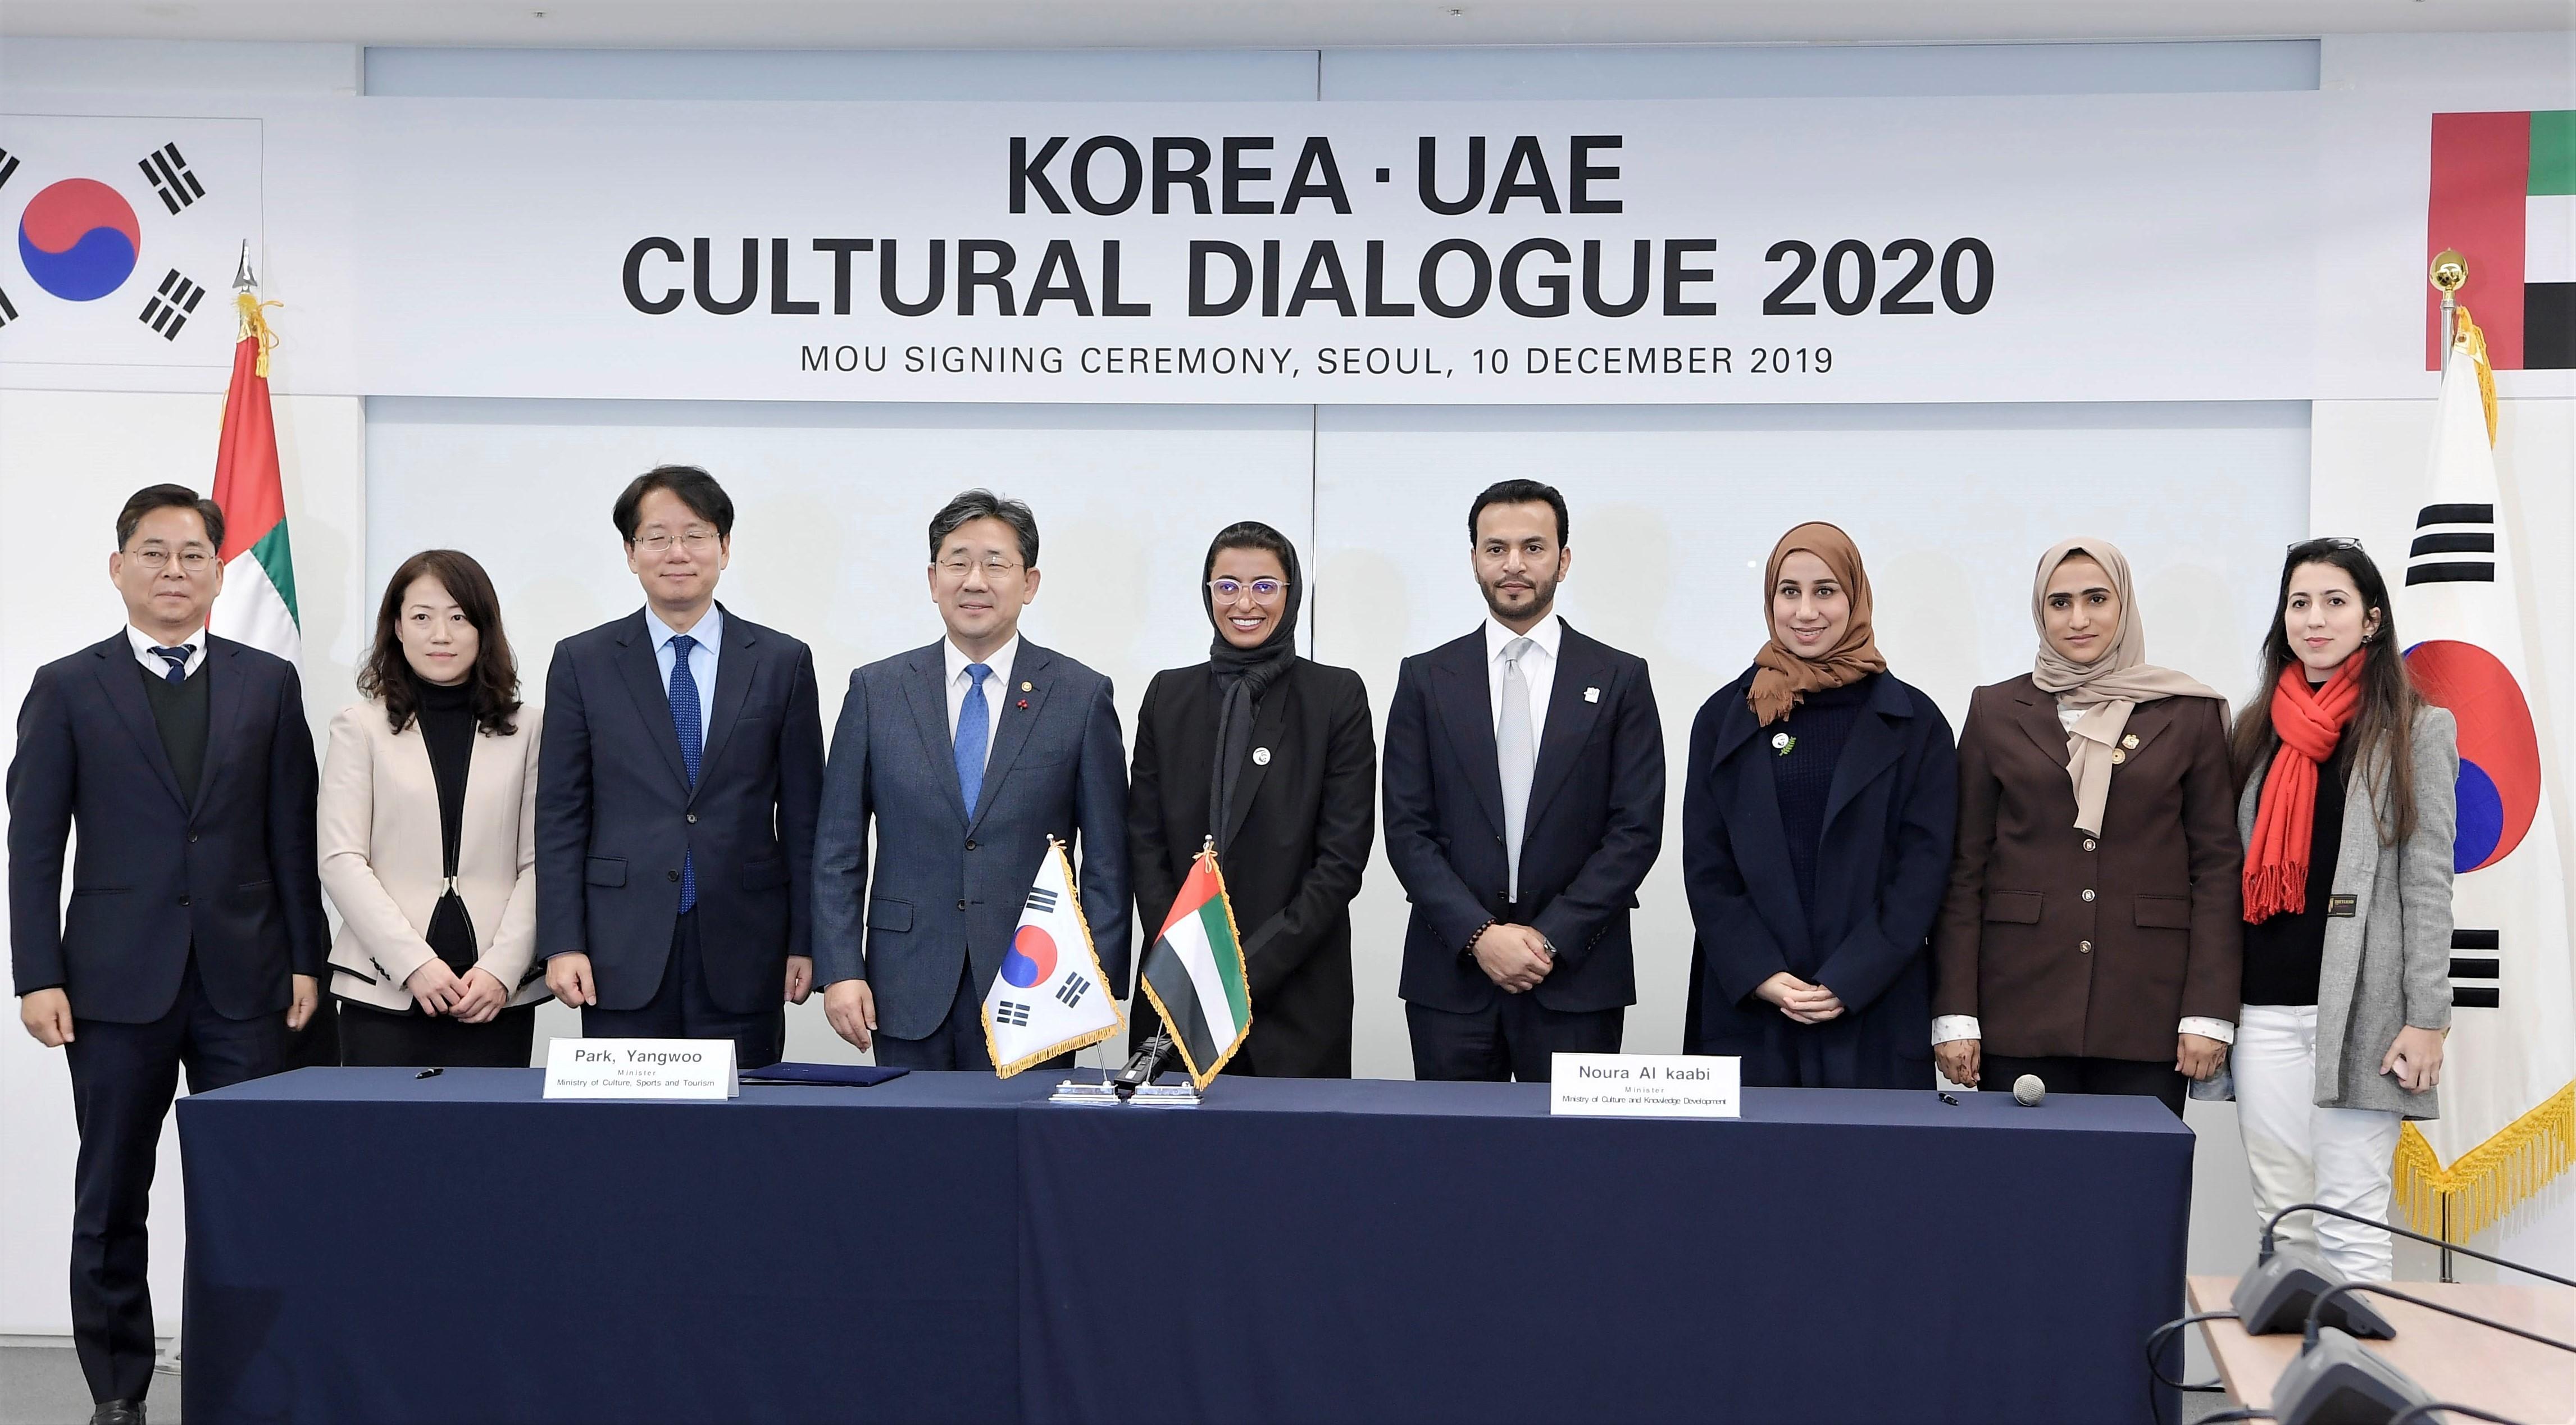 uae-korea cultural dialogue 2020 announced in seoul 2